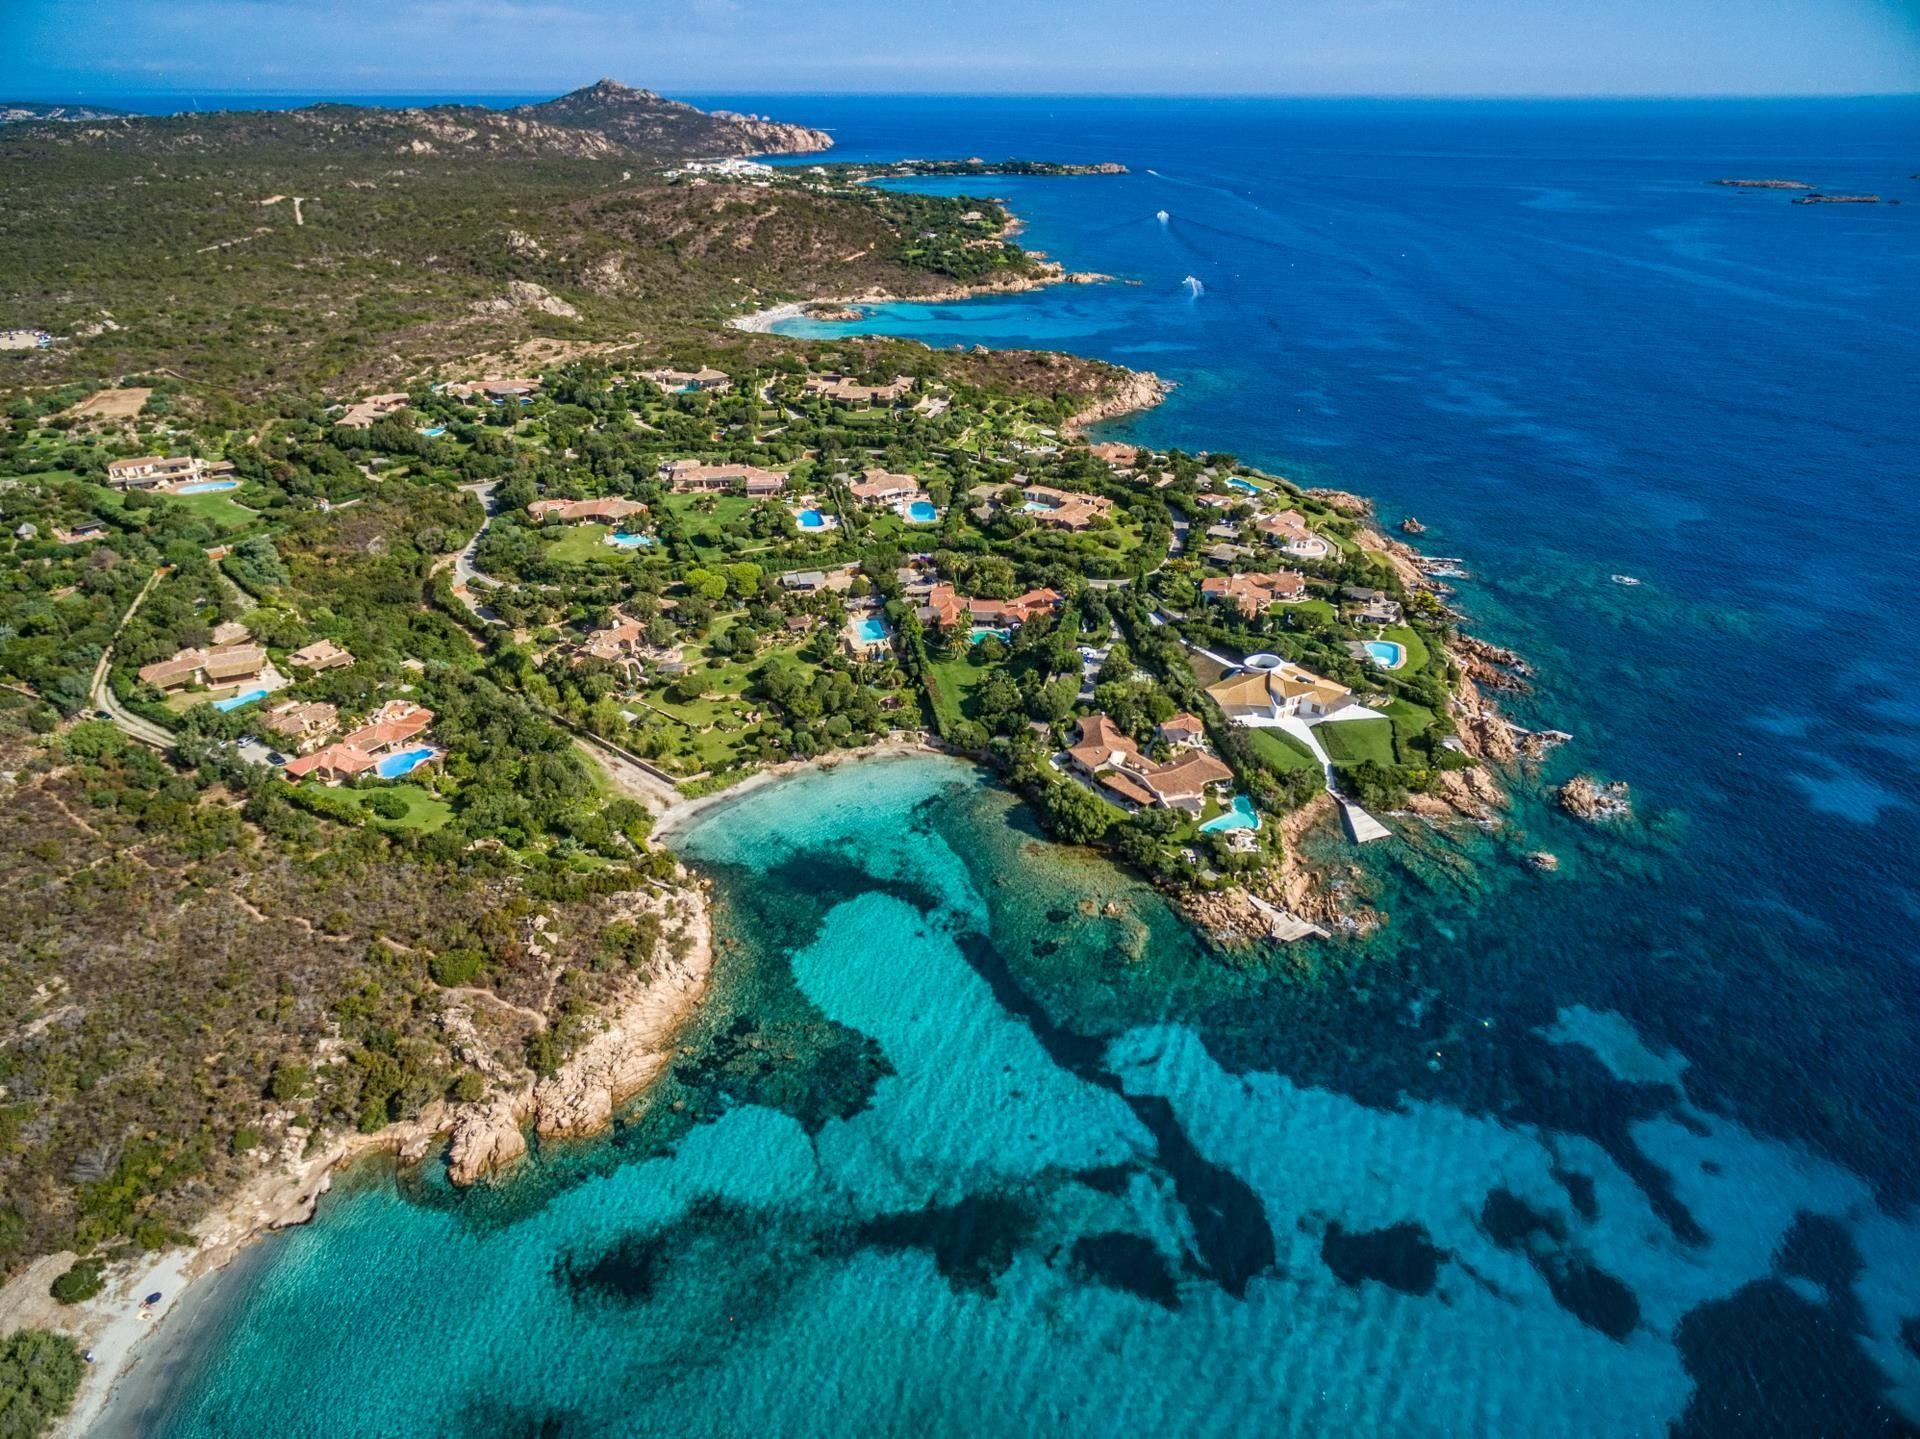 Costa smeralda sardinia properties for sale or rent for Arredi costa smeralda